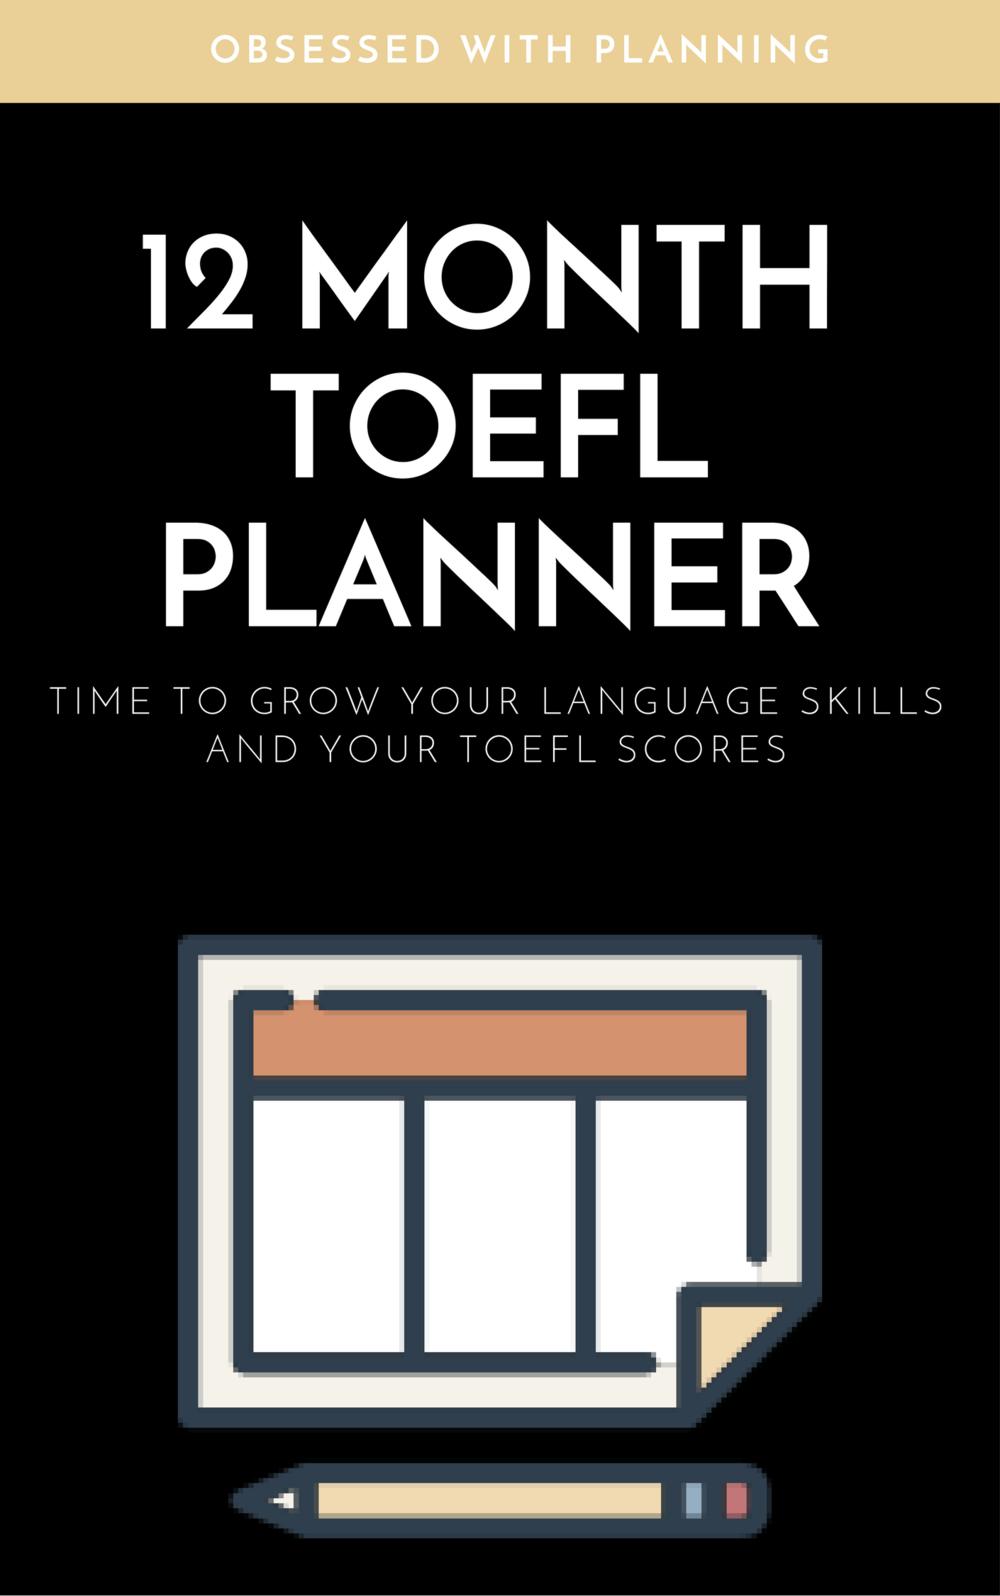 Copy of 12 Month TOEFL Planner.png